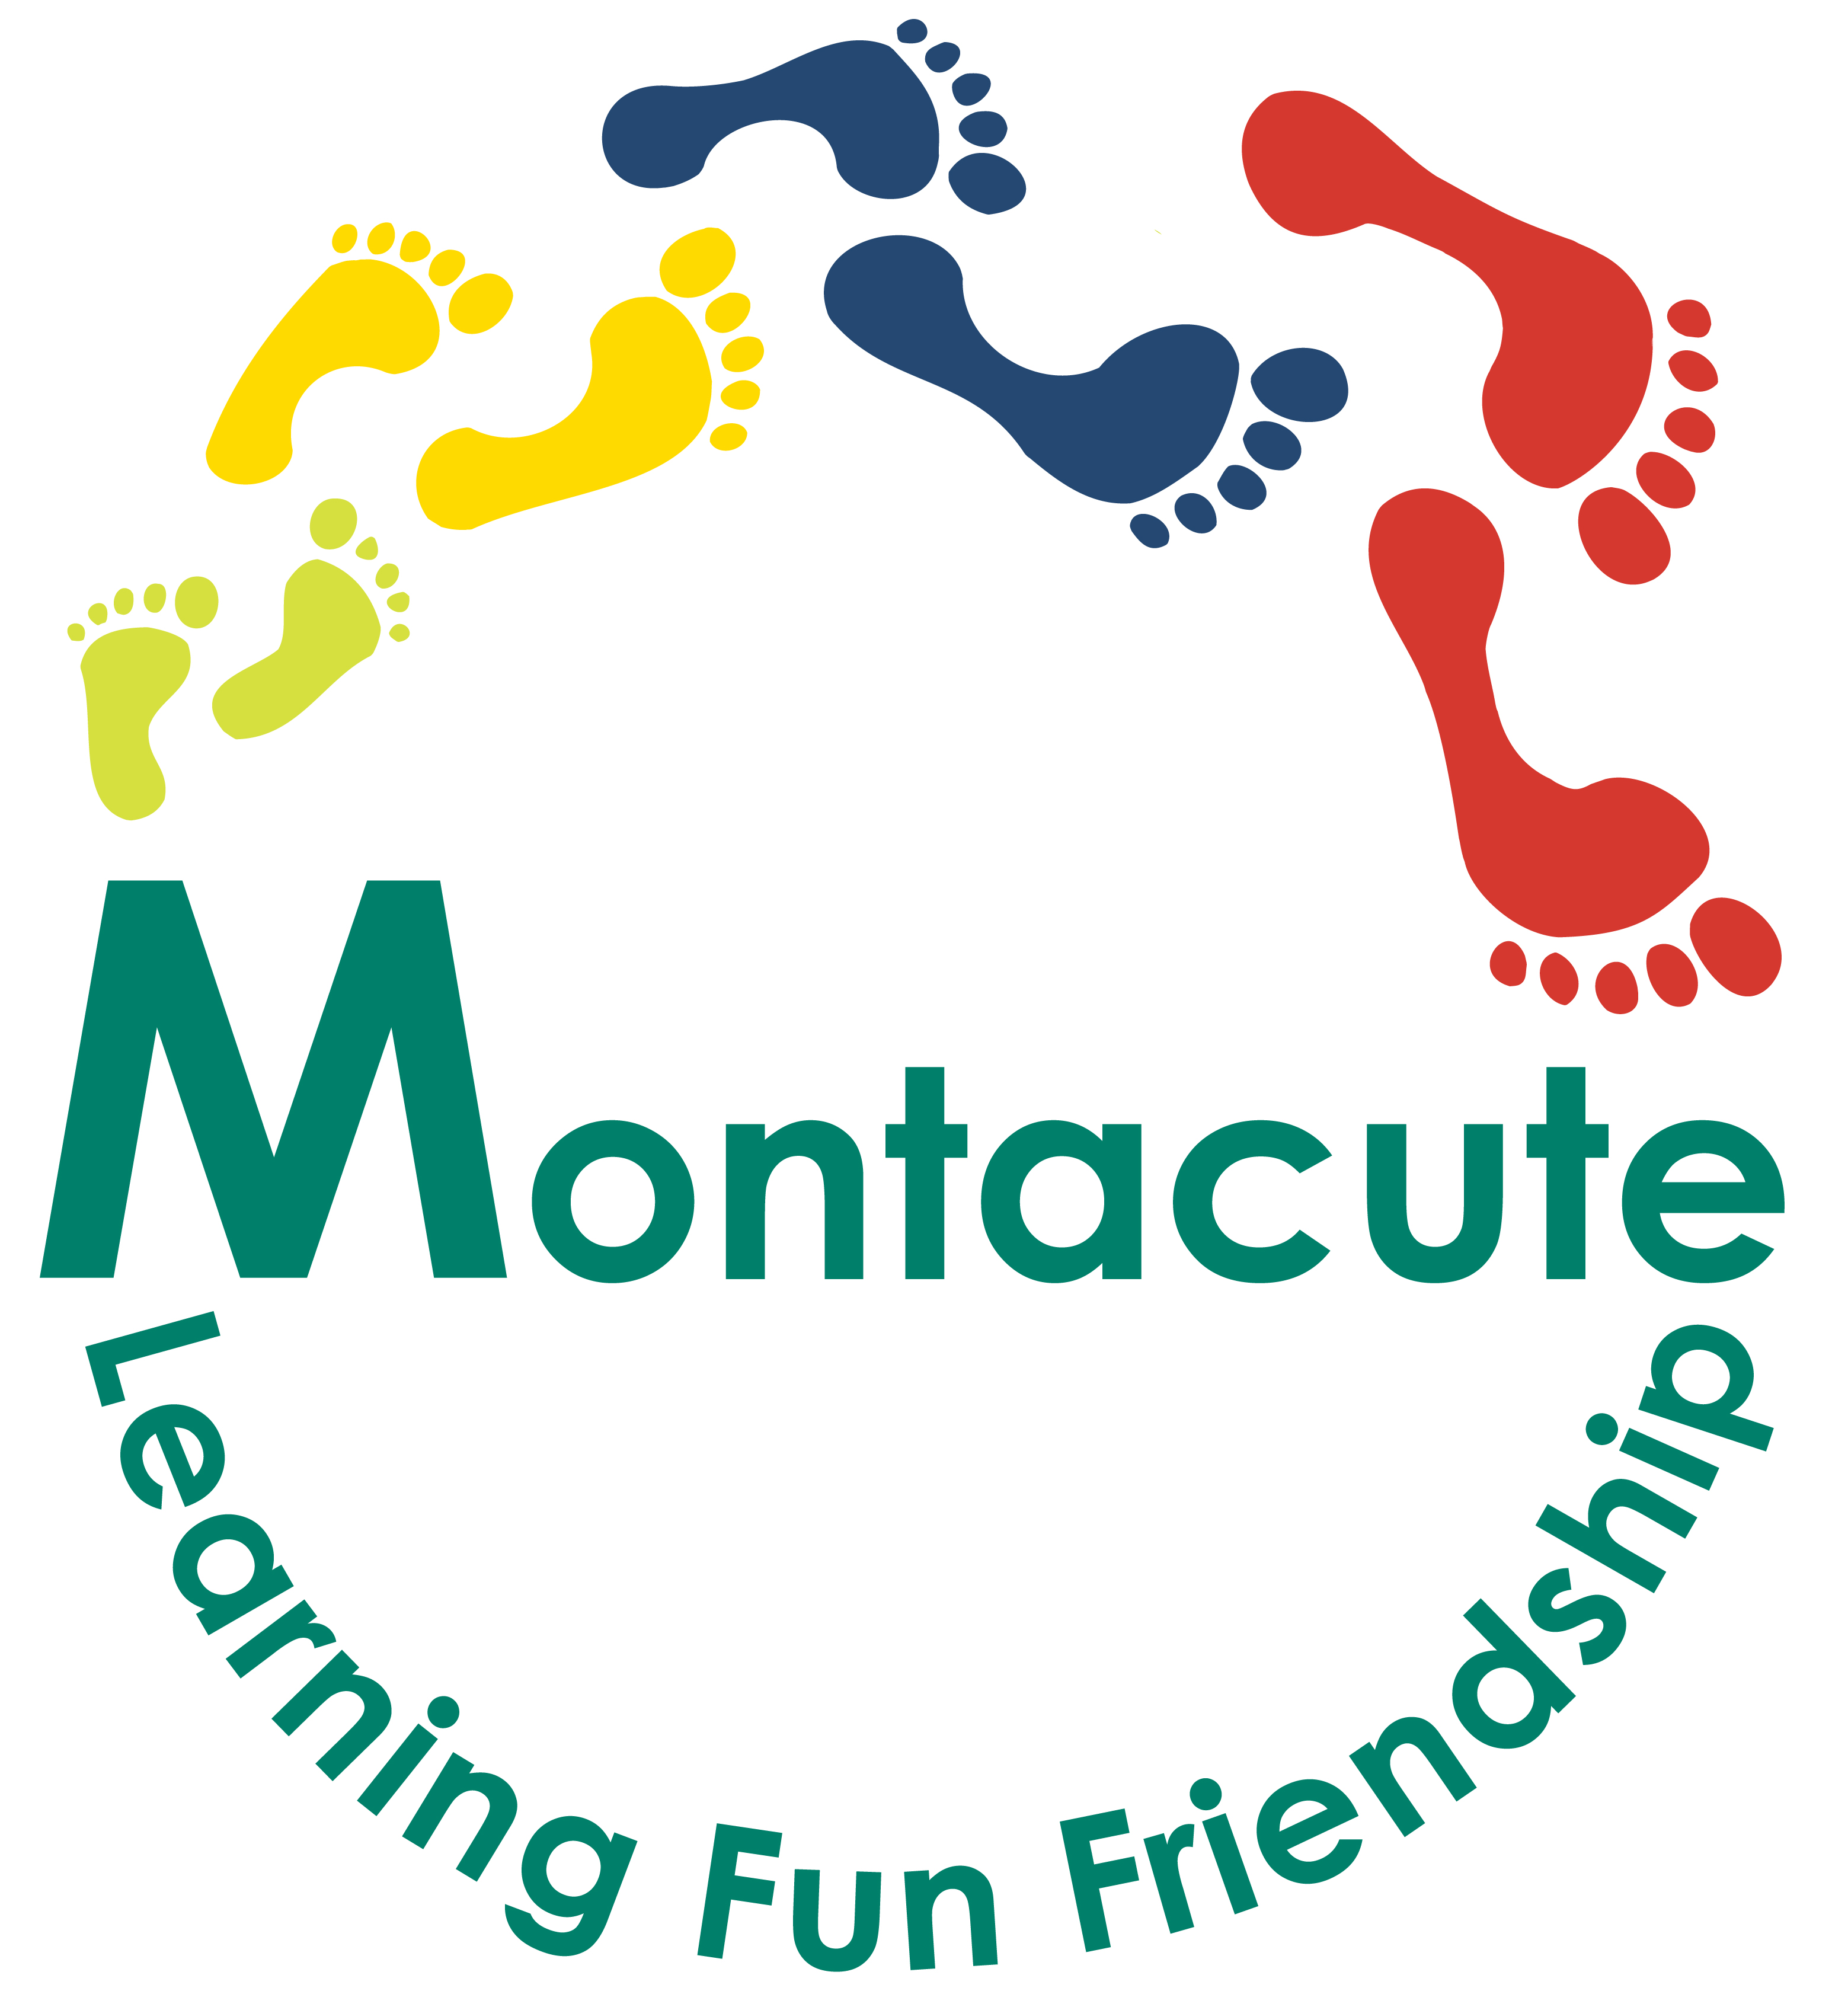 PARENTS AND FRIENDS OF MONTACUTE SCHOOL